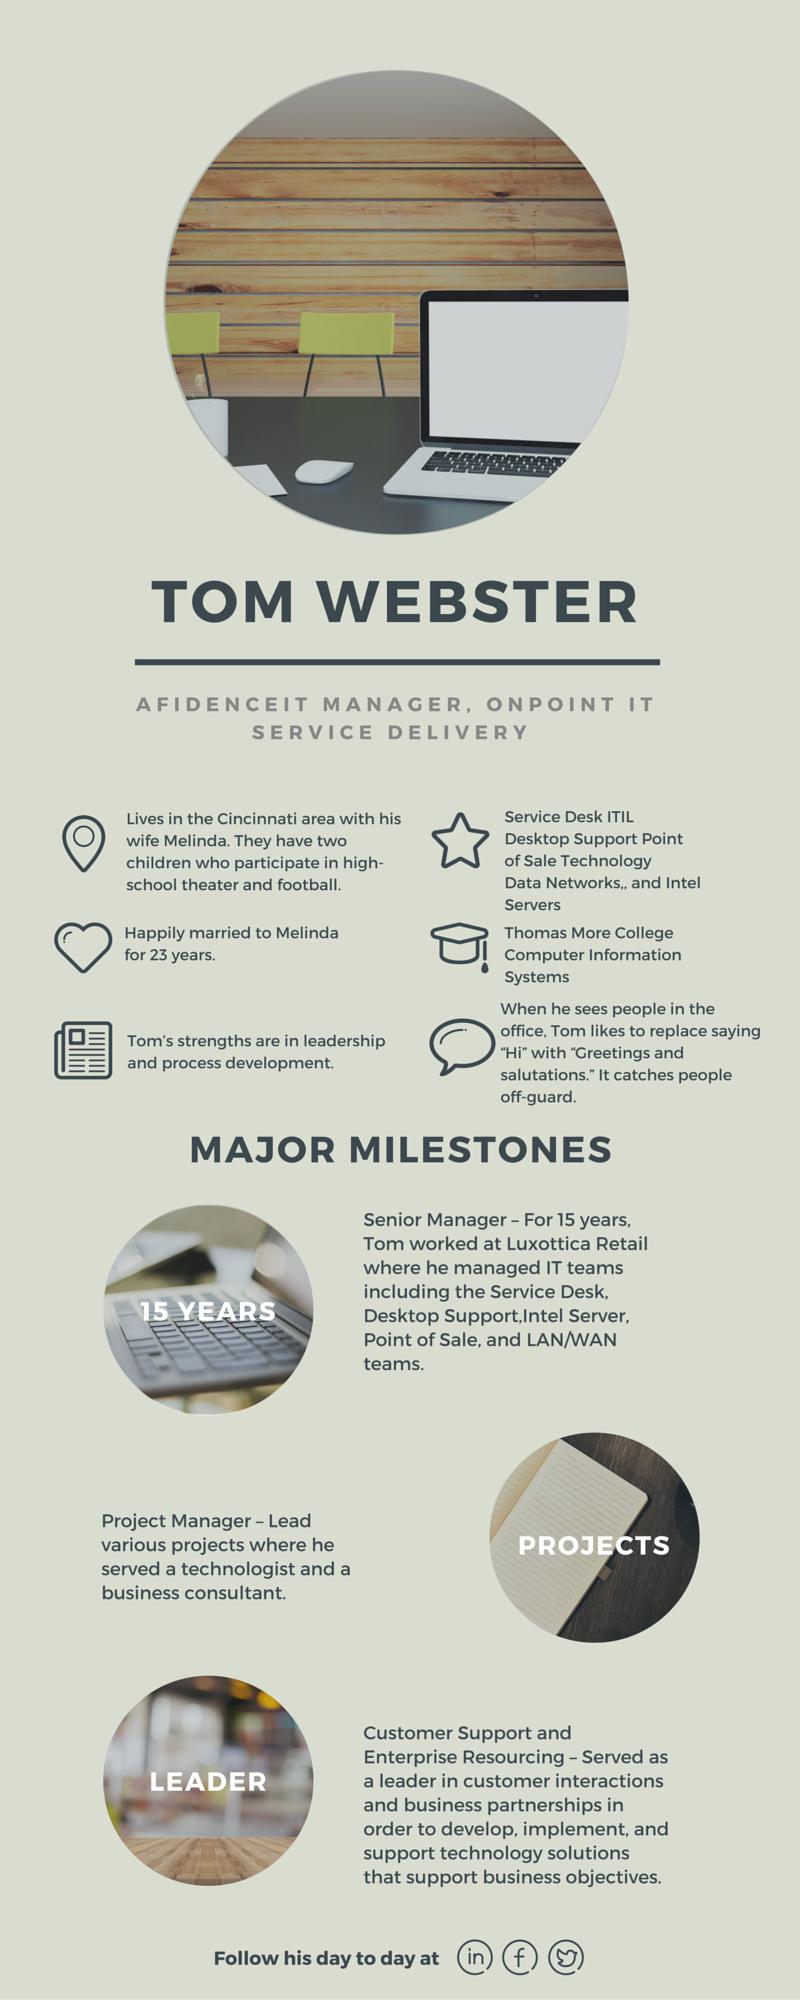 Meet Tom Webster Infographic